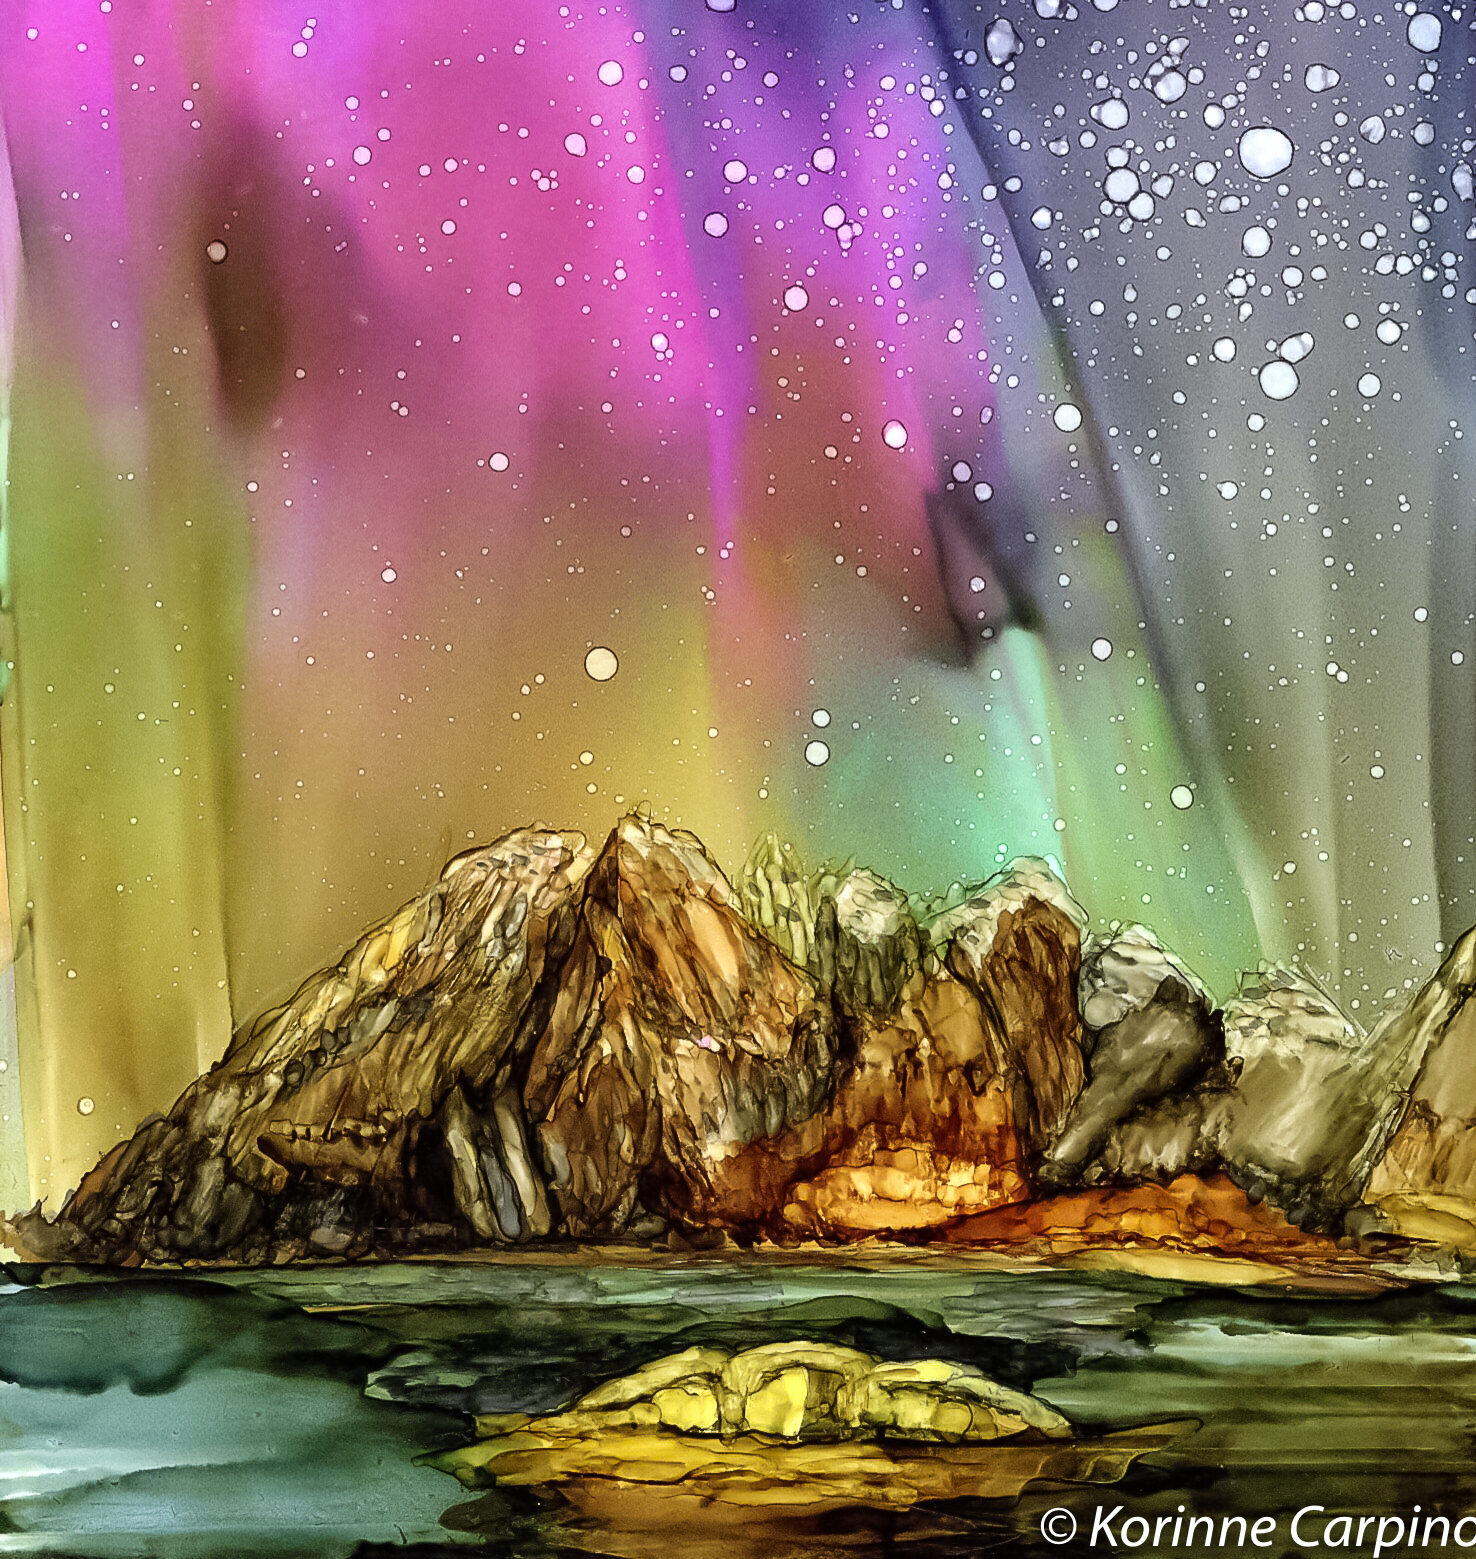 Alaskan Aurora Painting in Alcohol Ink by Korinne Carpino